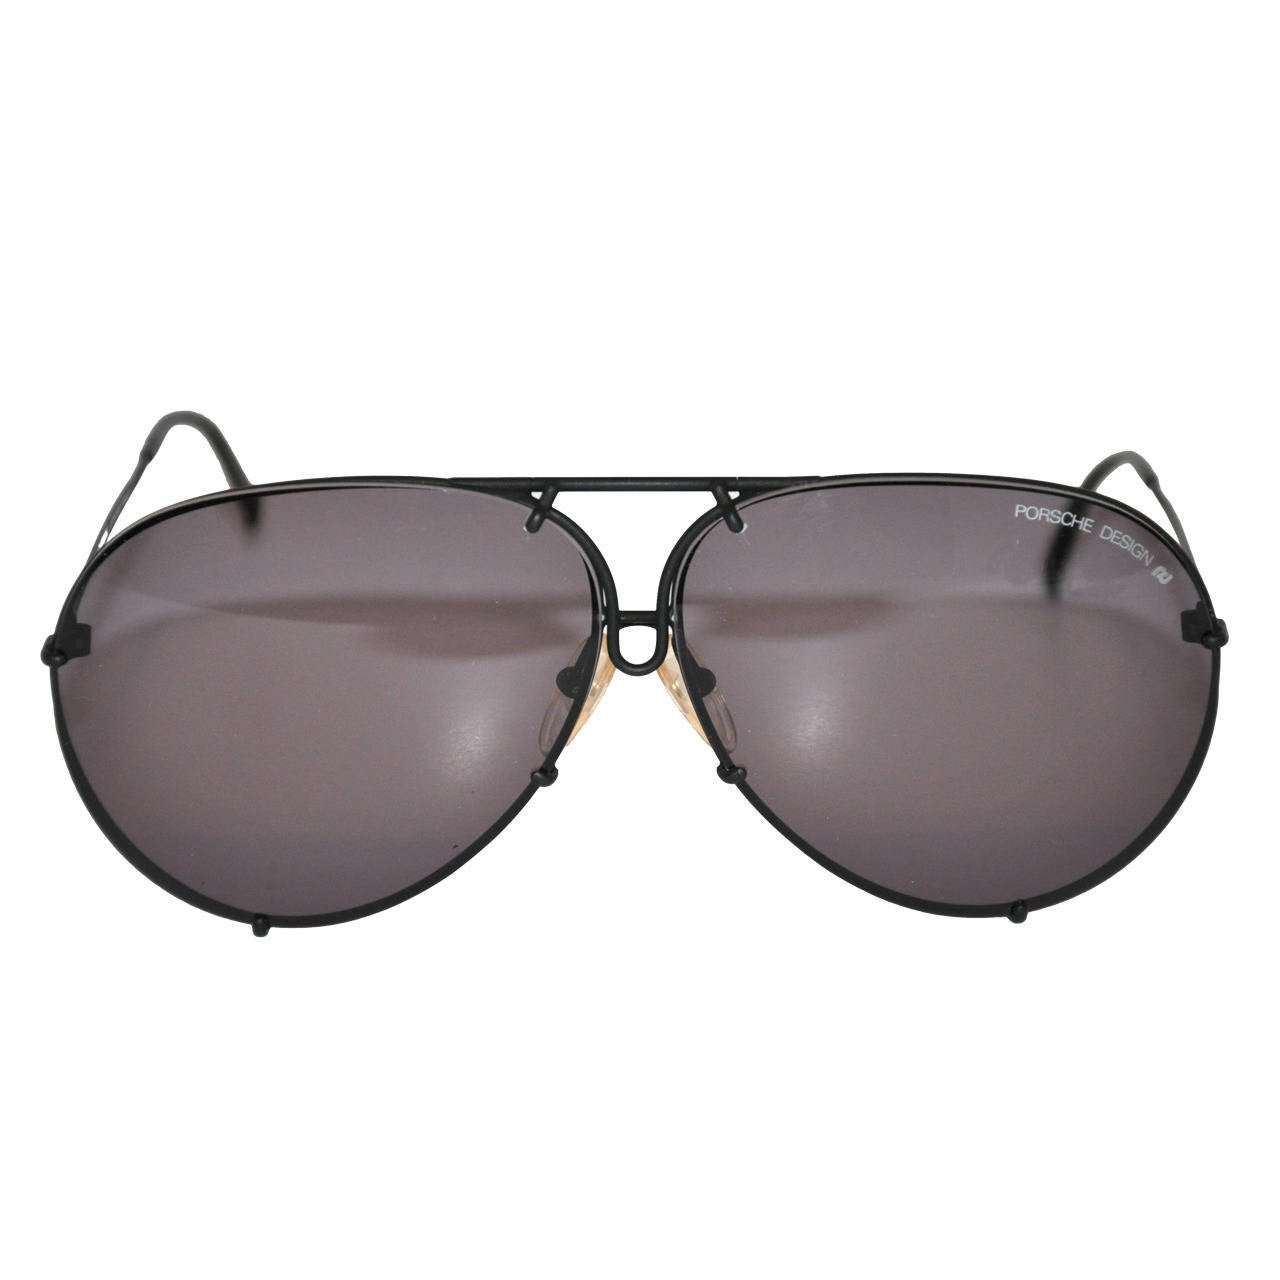 Porsche Design By Carrera Men S Sunglasses At 1stdibs